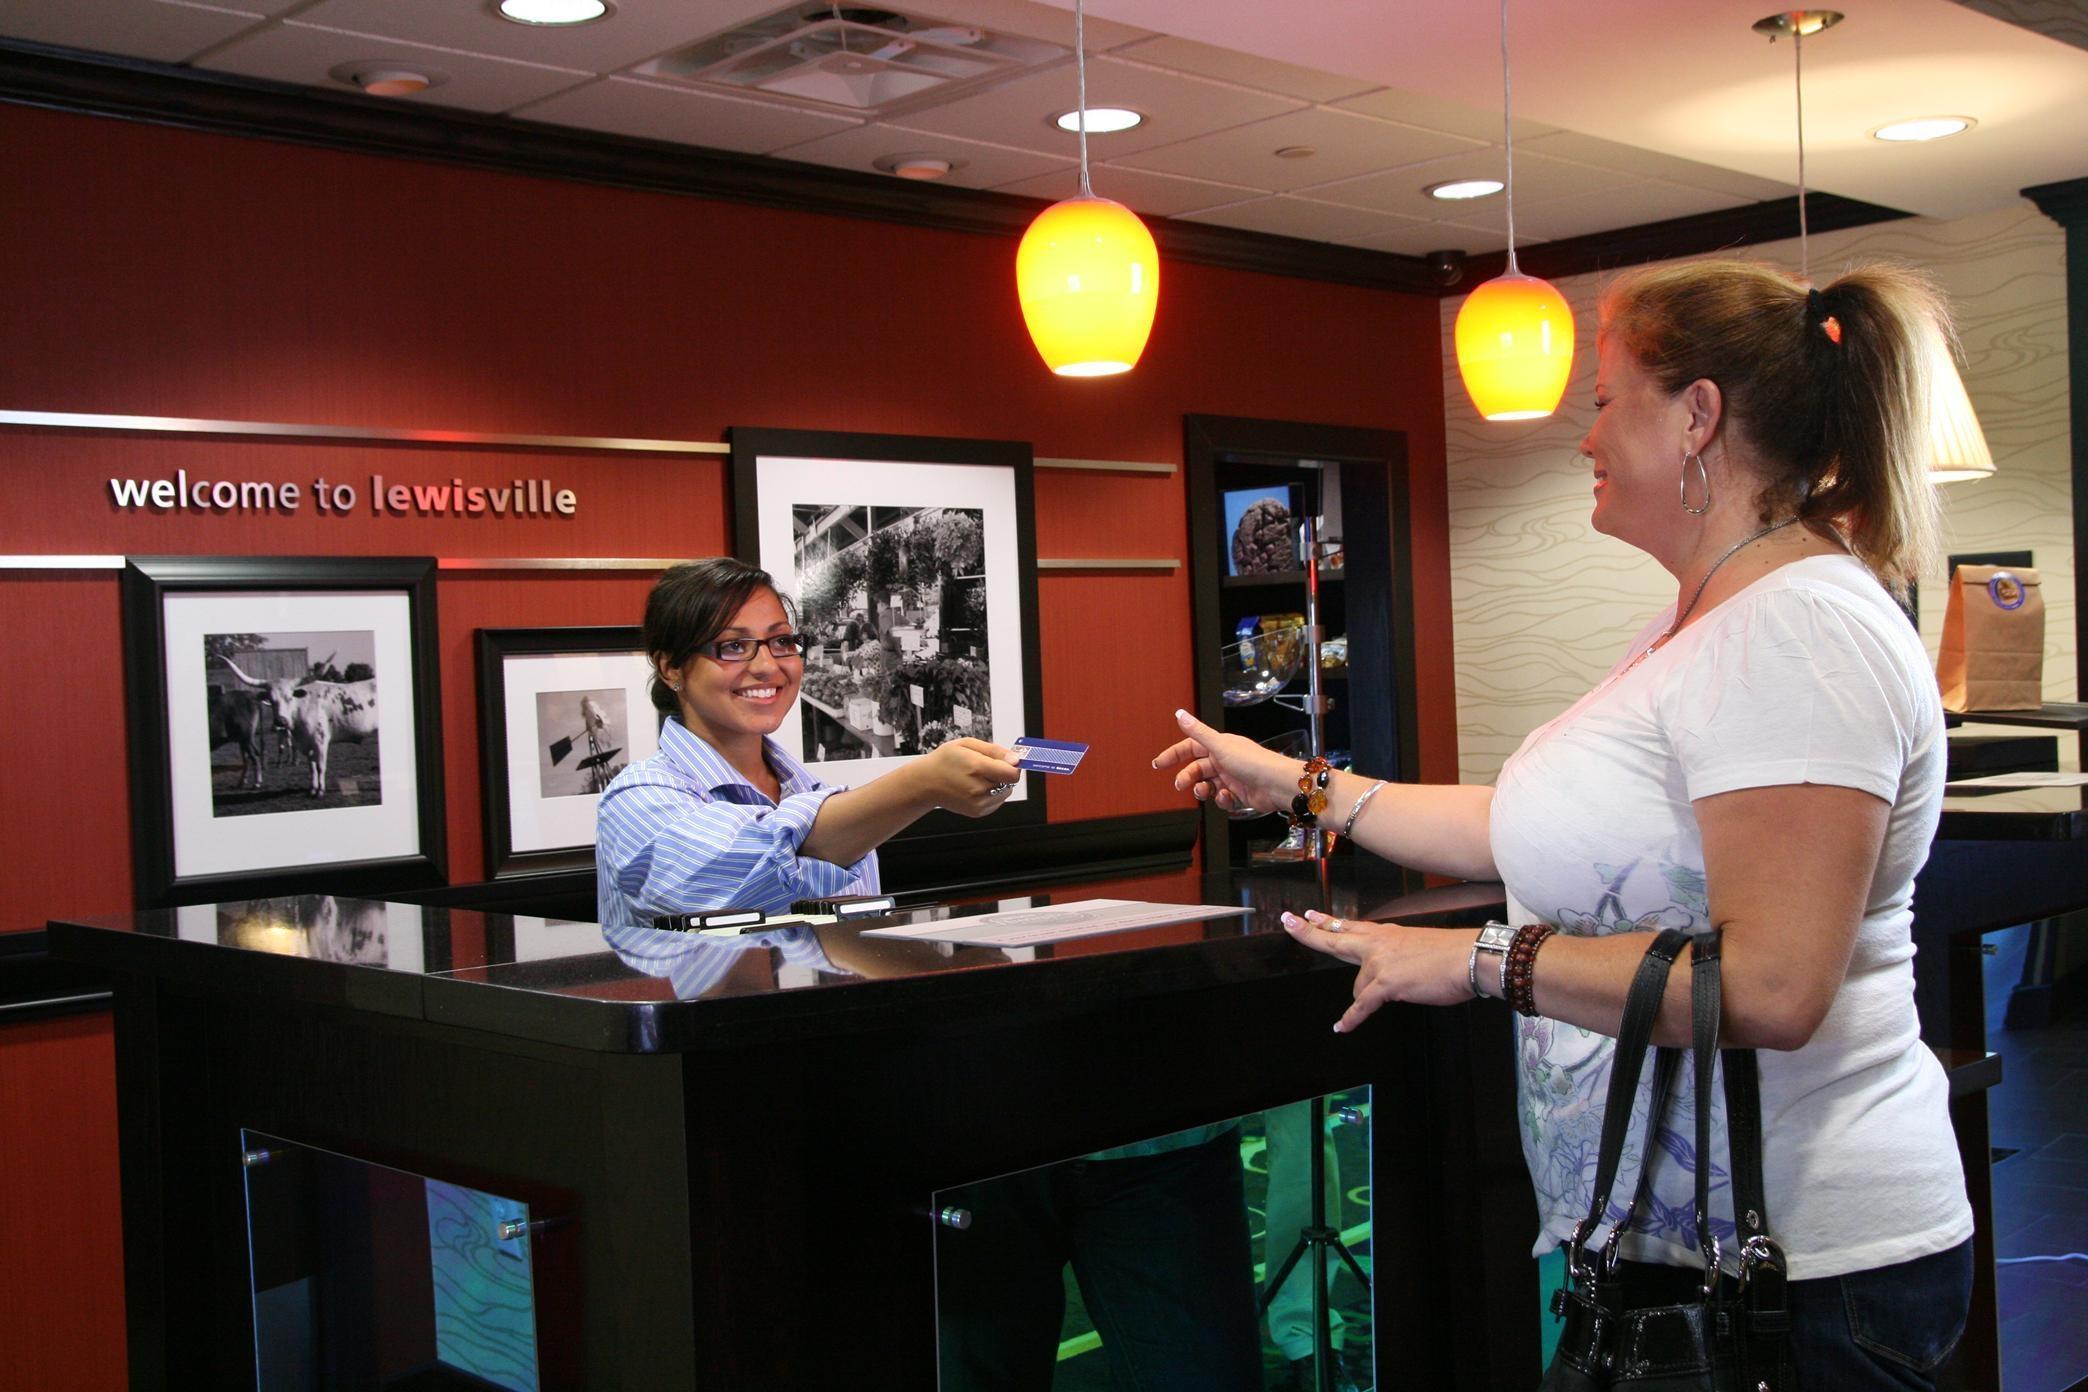 Hampton Inn & Suites Dallas/Lewisville-Vista Ridge Mall, TX image 4